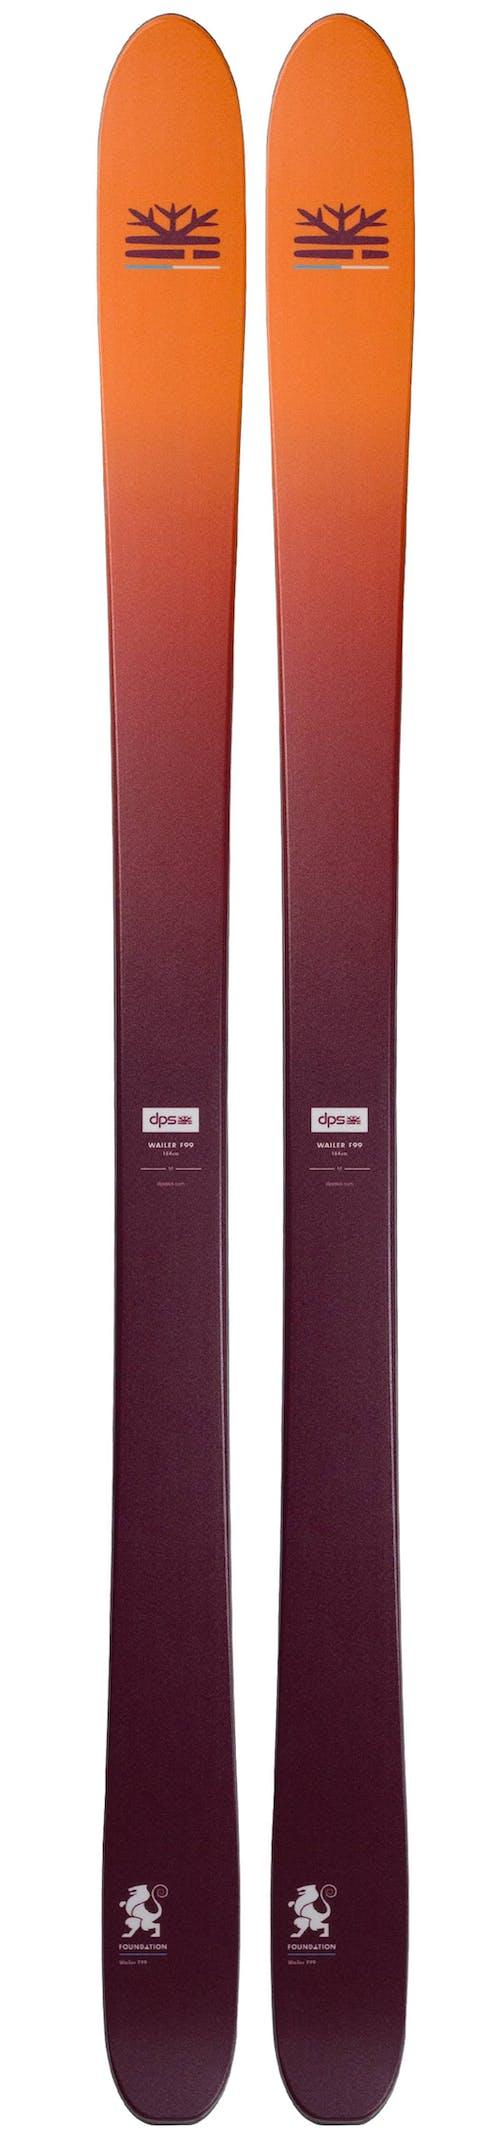 DPS Wailer 99 Foundation Skis - 176 cm